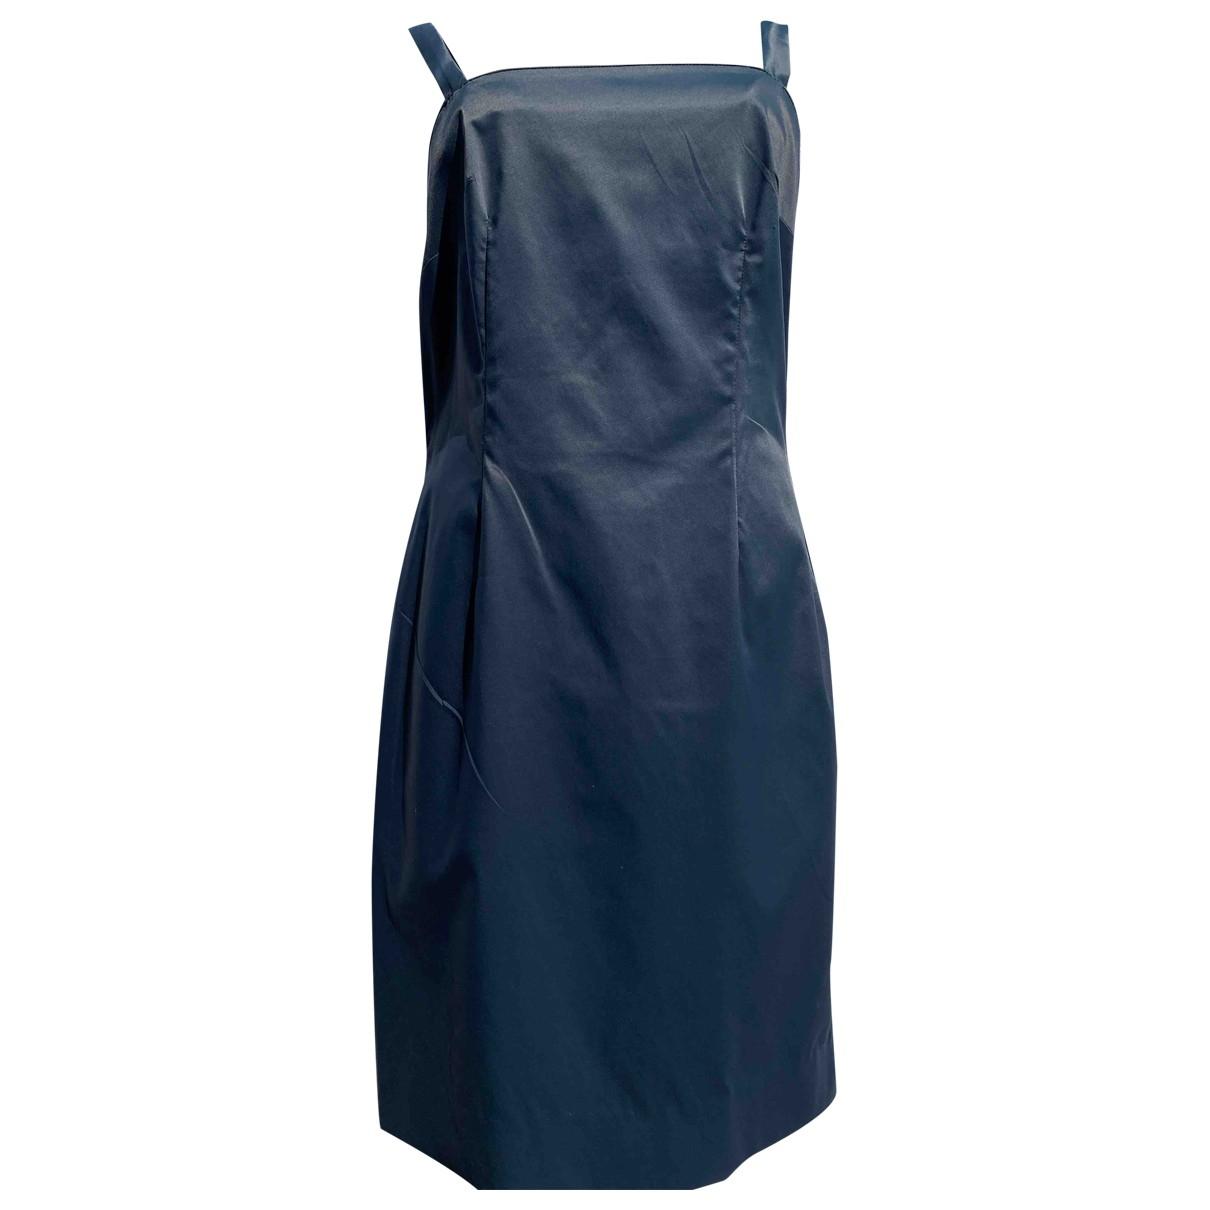 Fendi \N Blue Cotton - elasthane dress for Women 42 IT